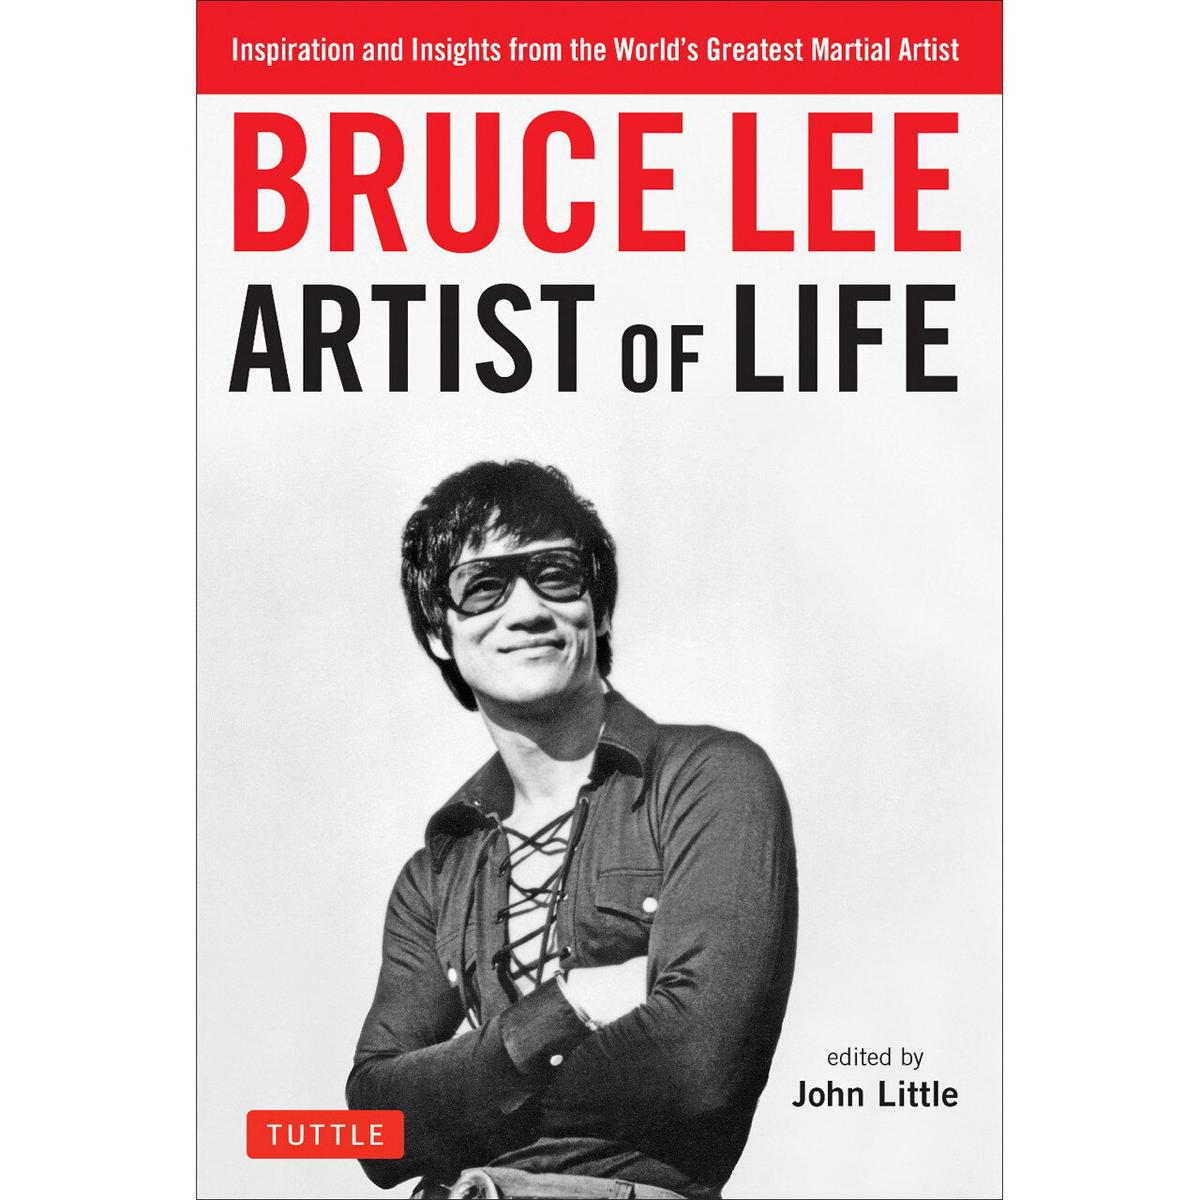 XL Bruce Lee Artist of Life Book